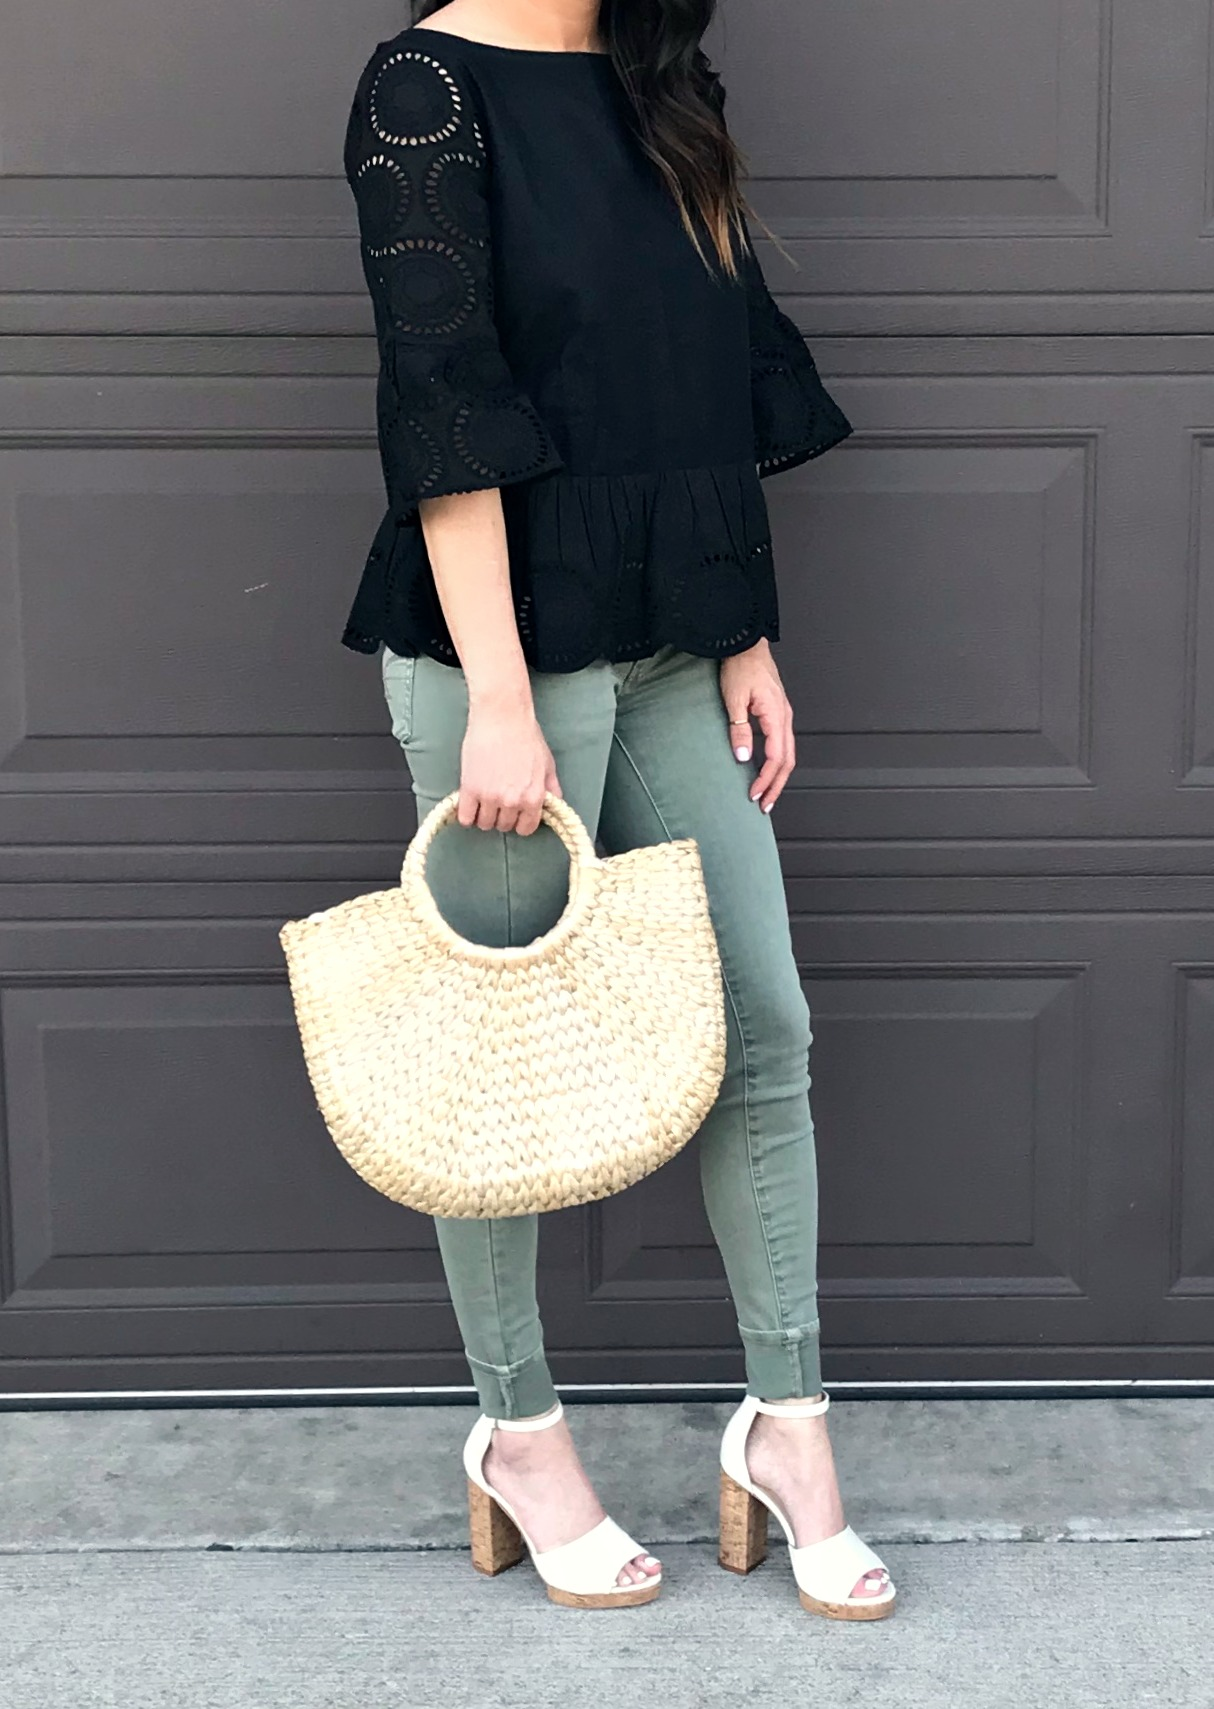 Green Pants, Straw Bag, Sandals